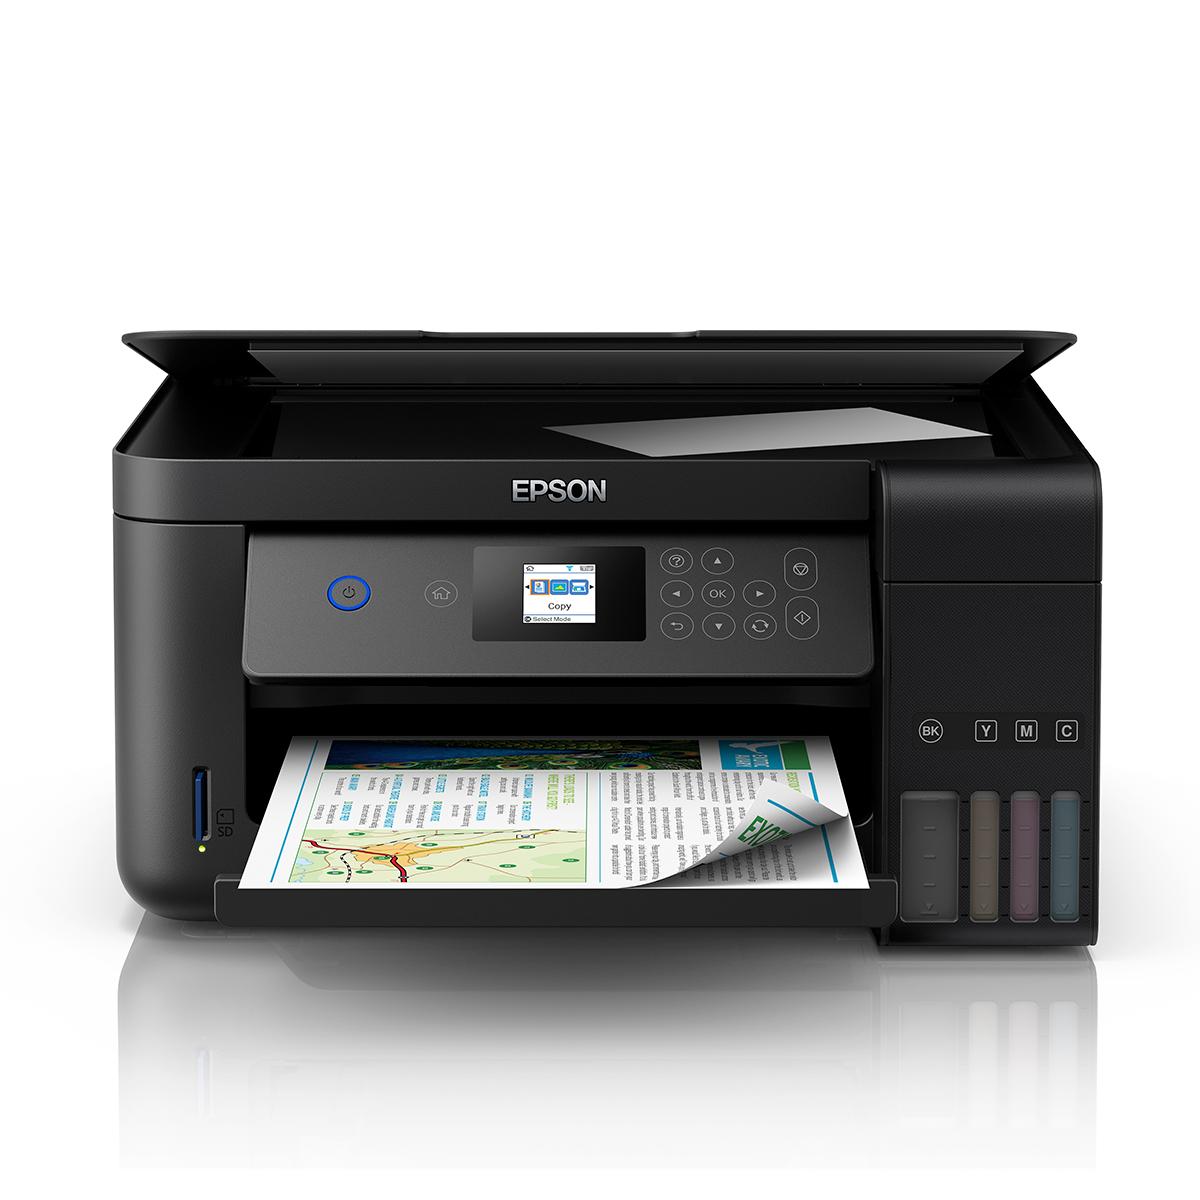 Epson EcoTank ET-2750 A4 Colour Inkjet Multifunction